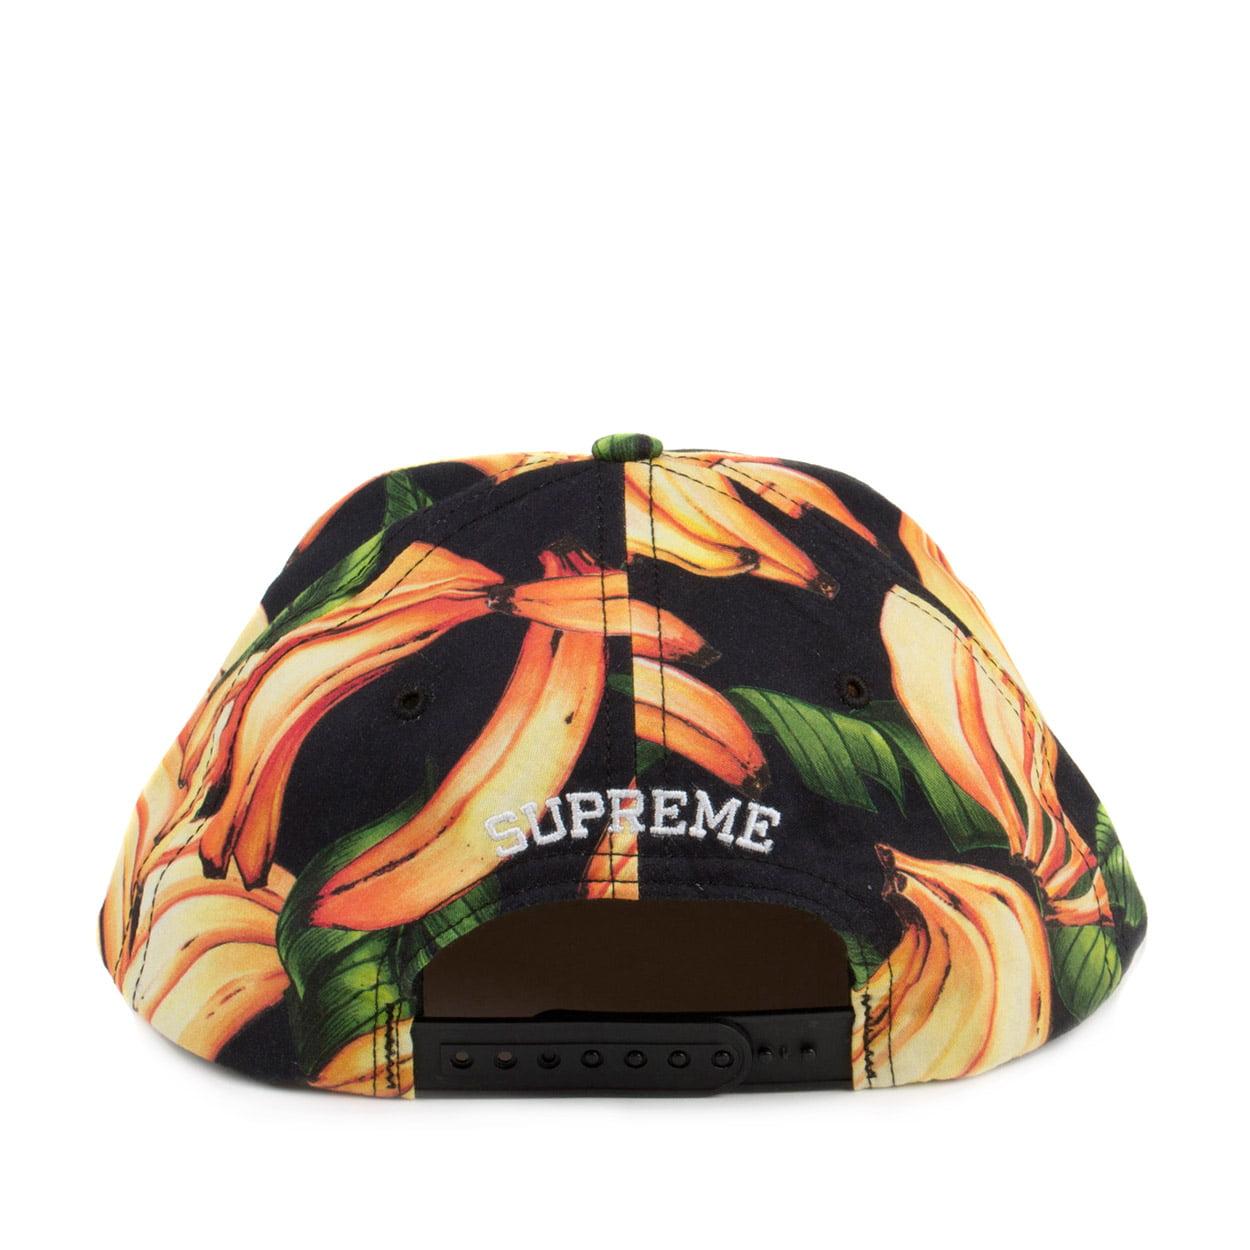 Supreme - Supreme Banana Snapback 5-Panel Hat Black Yellow SS16H70 -  Walmart.com 756dd3b71c4